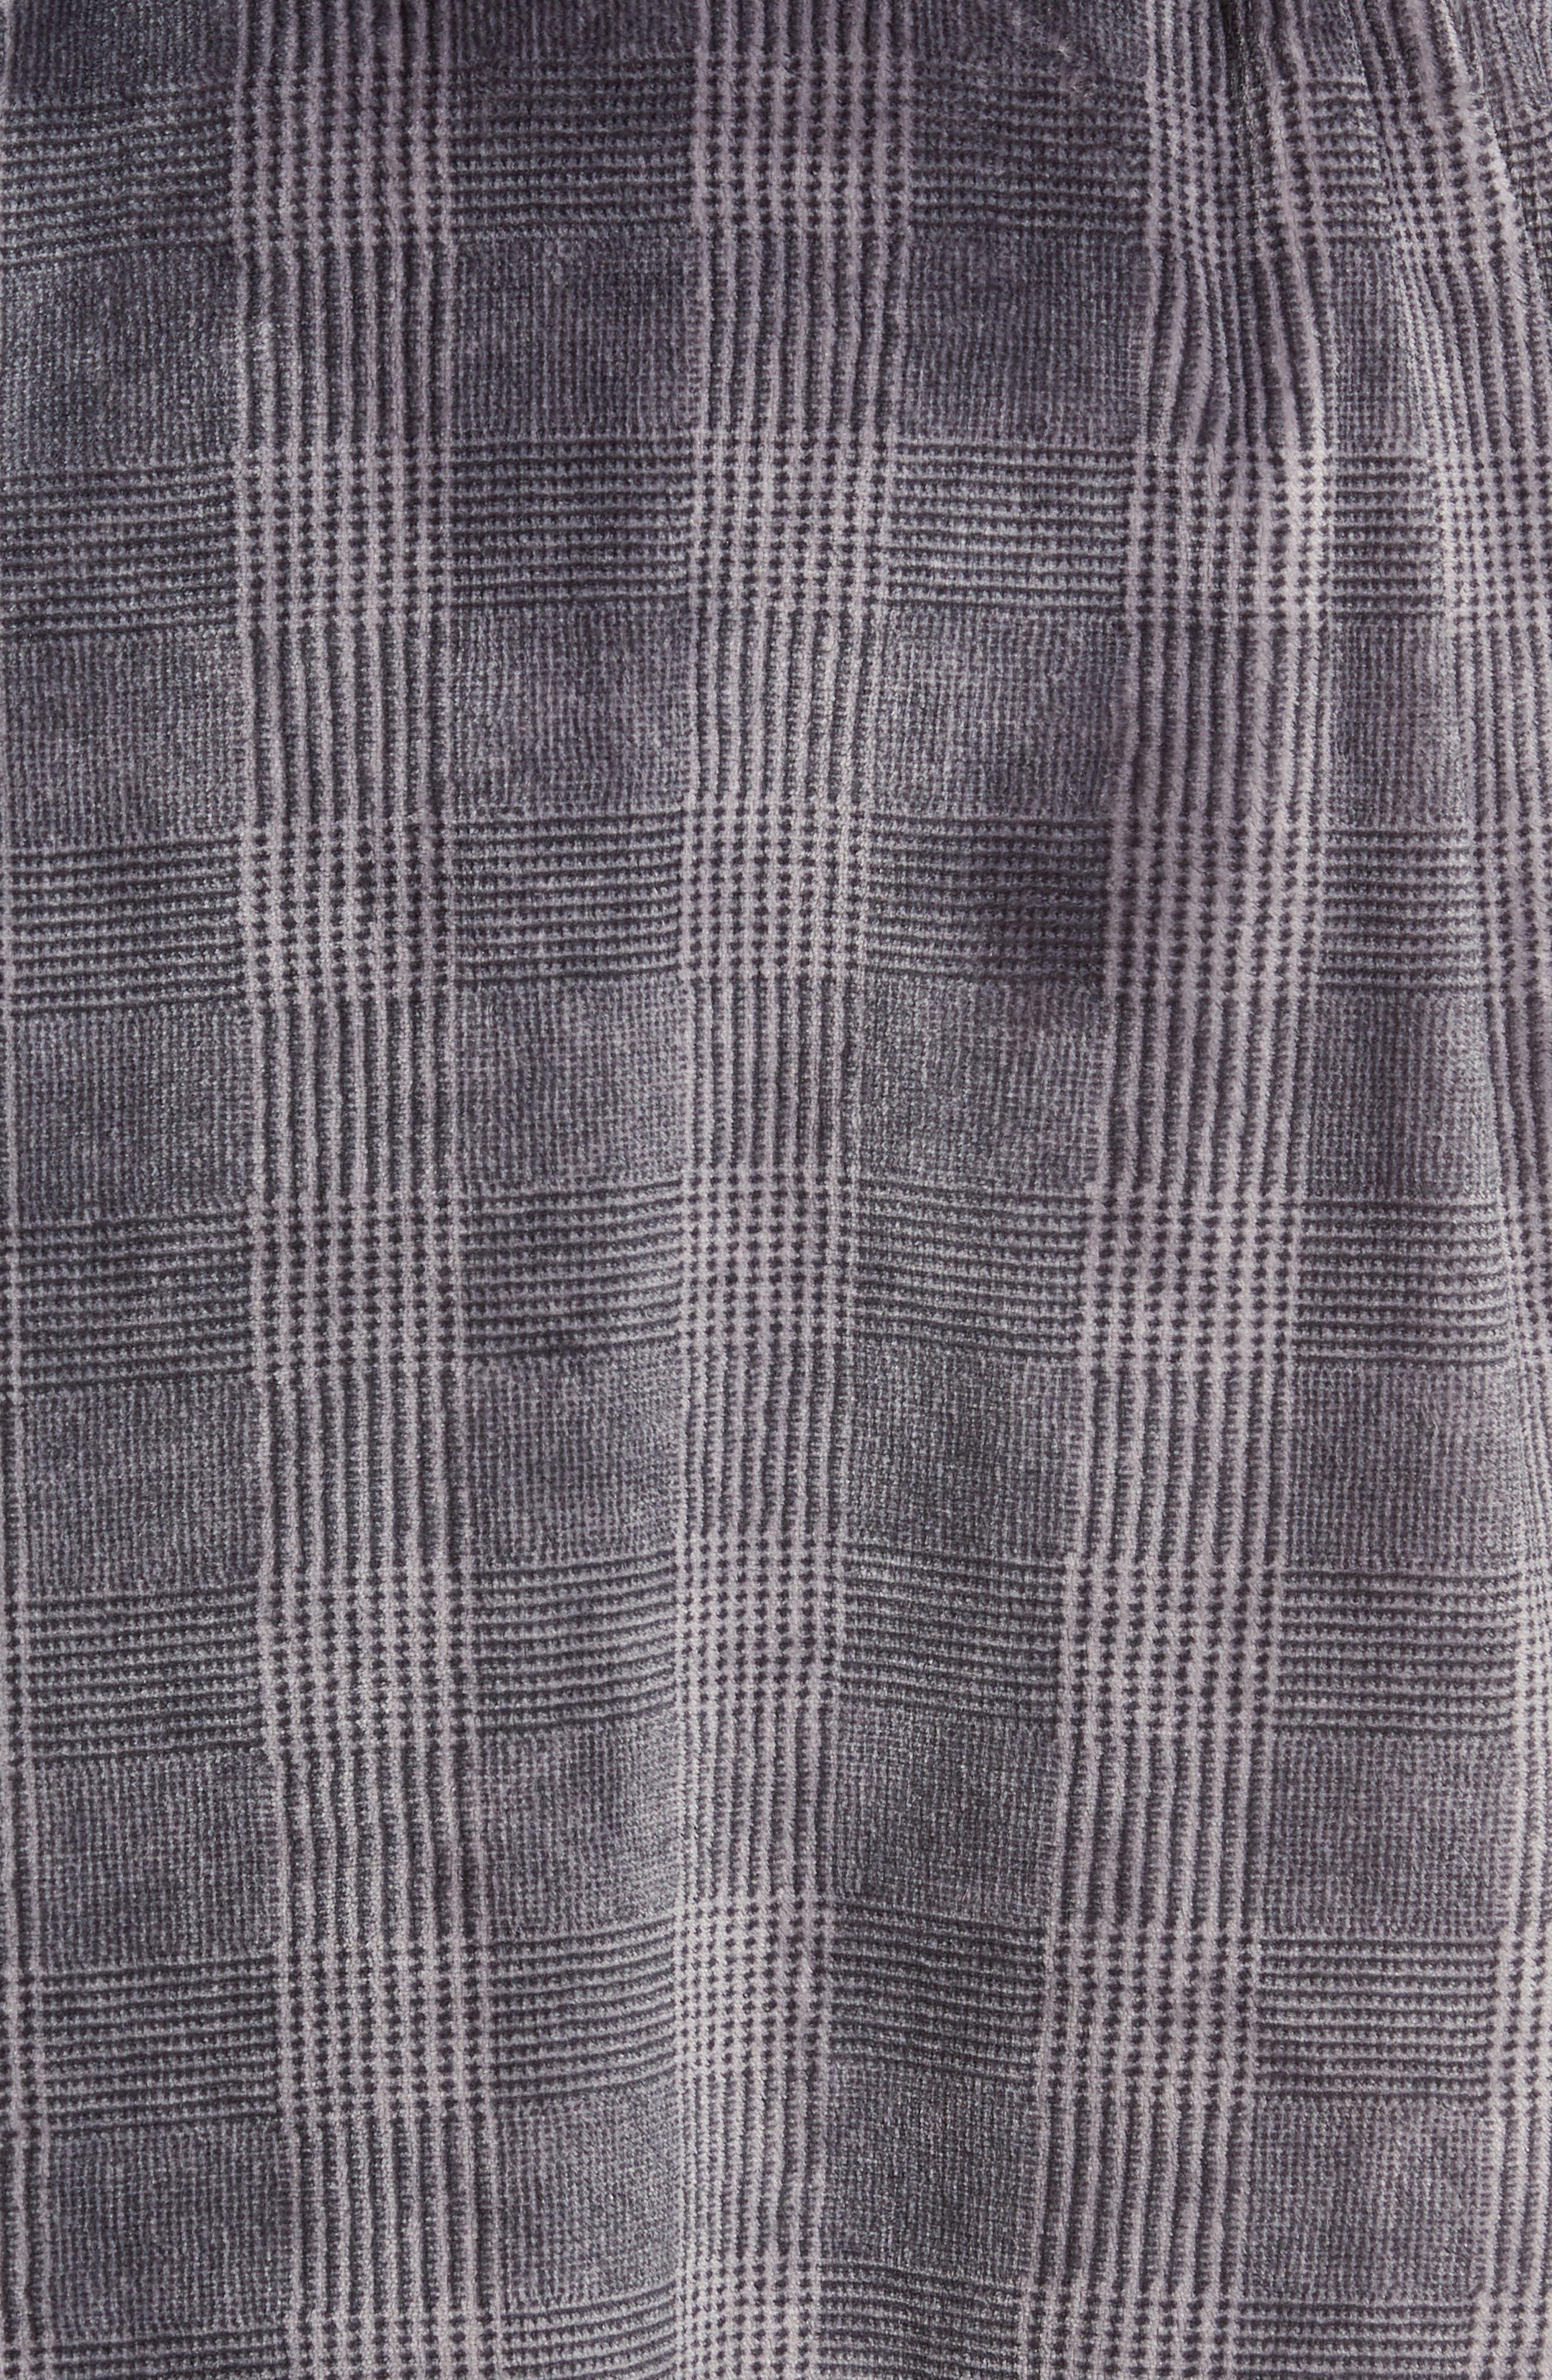 Glen Check Fleece Robe,                             Alternate thumbnail 5, color,                             BLACK - CHARCOAL GLEN CHECK